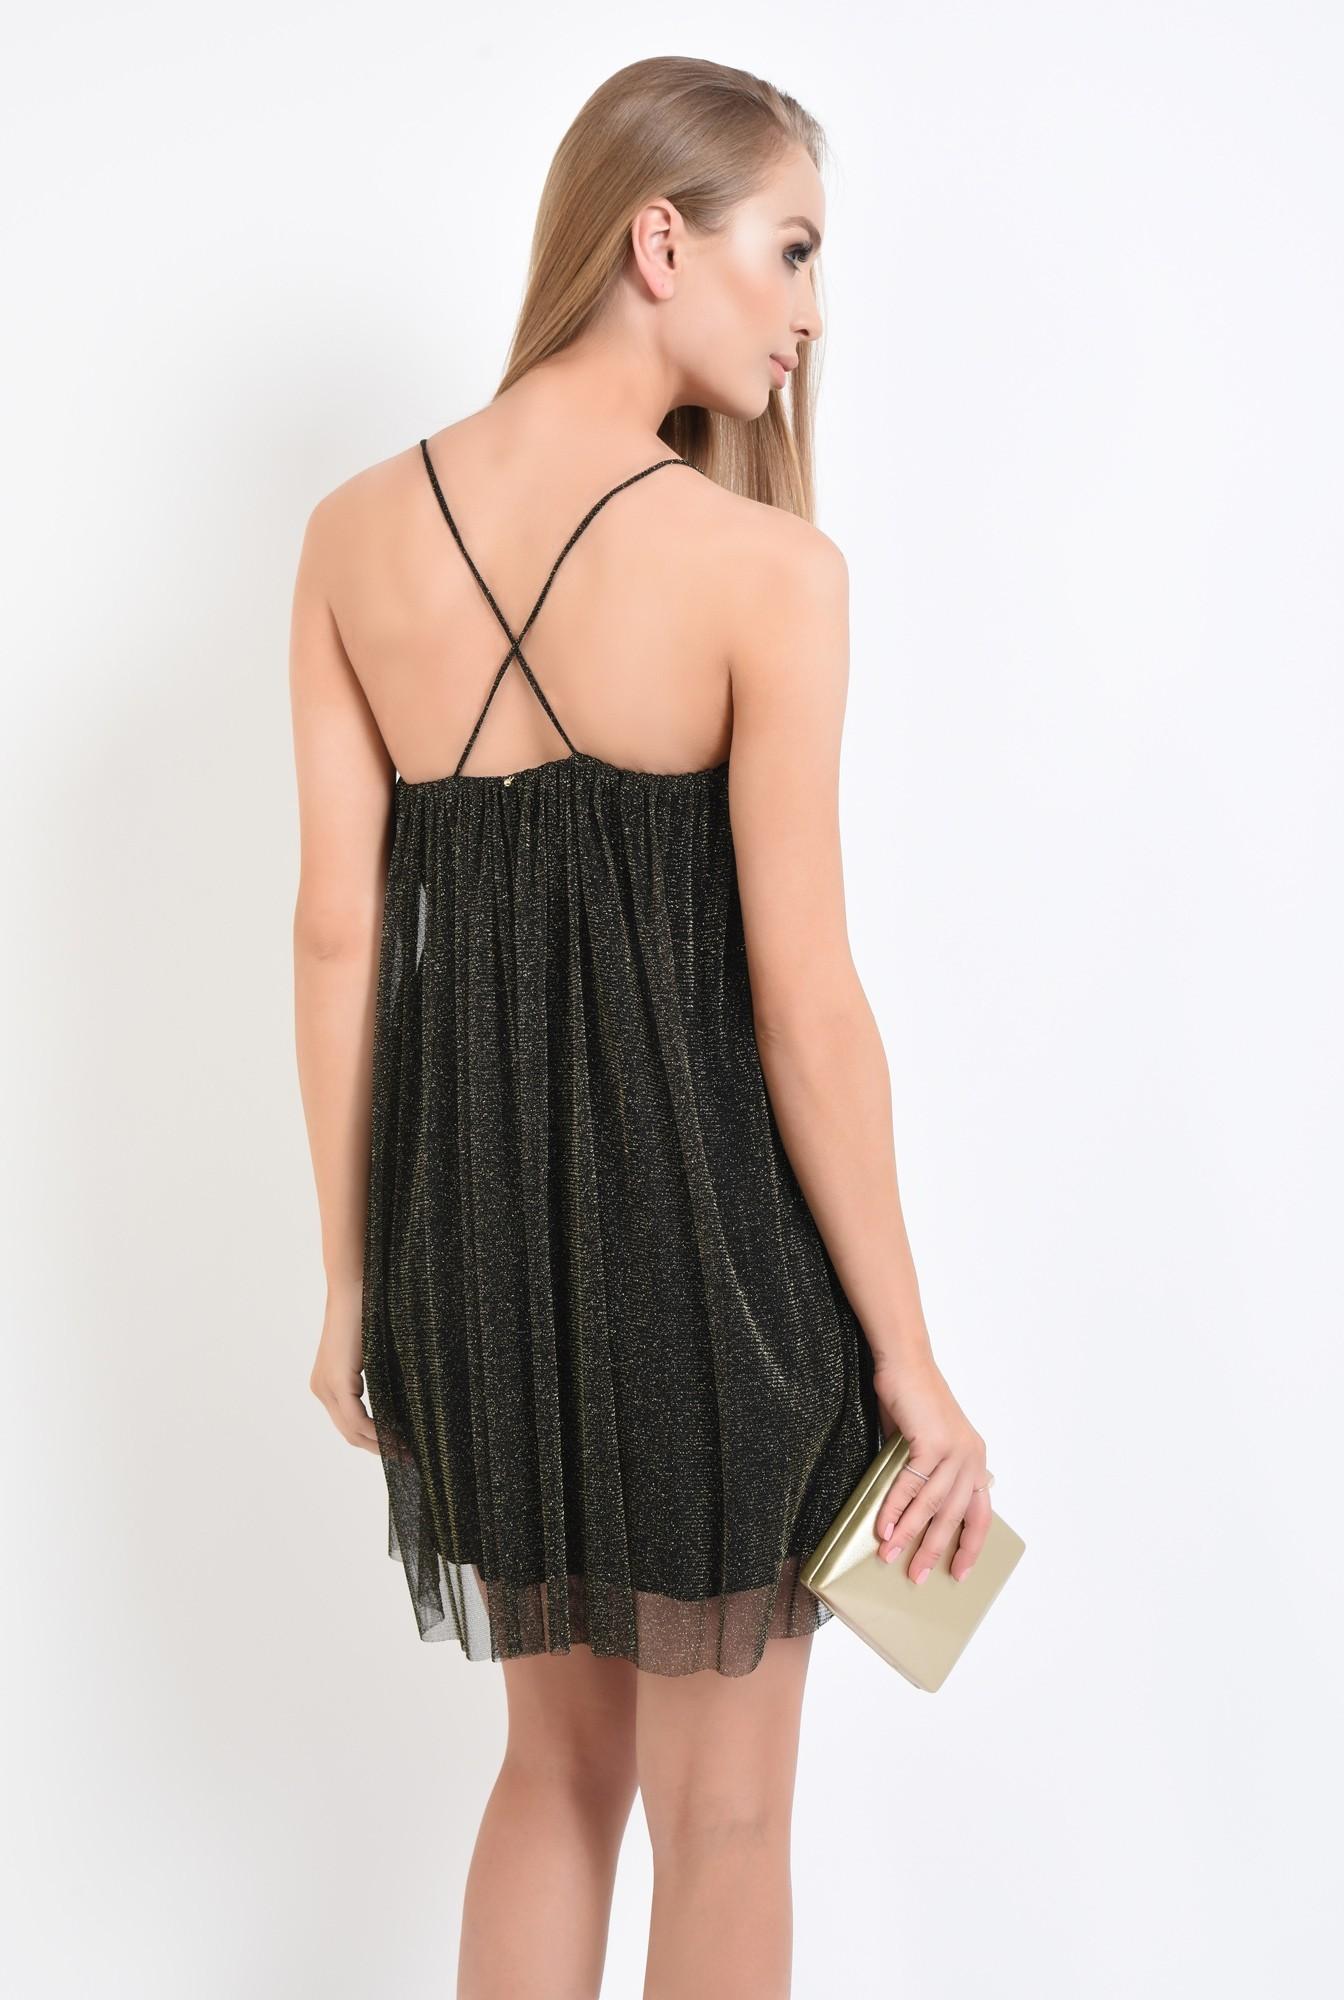 1 - rochie eleganta, negru, bretele subtiri, mini